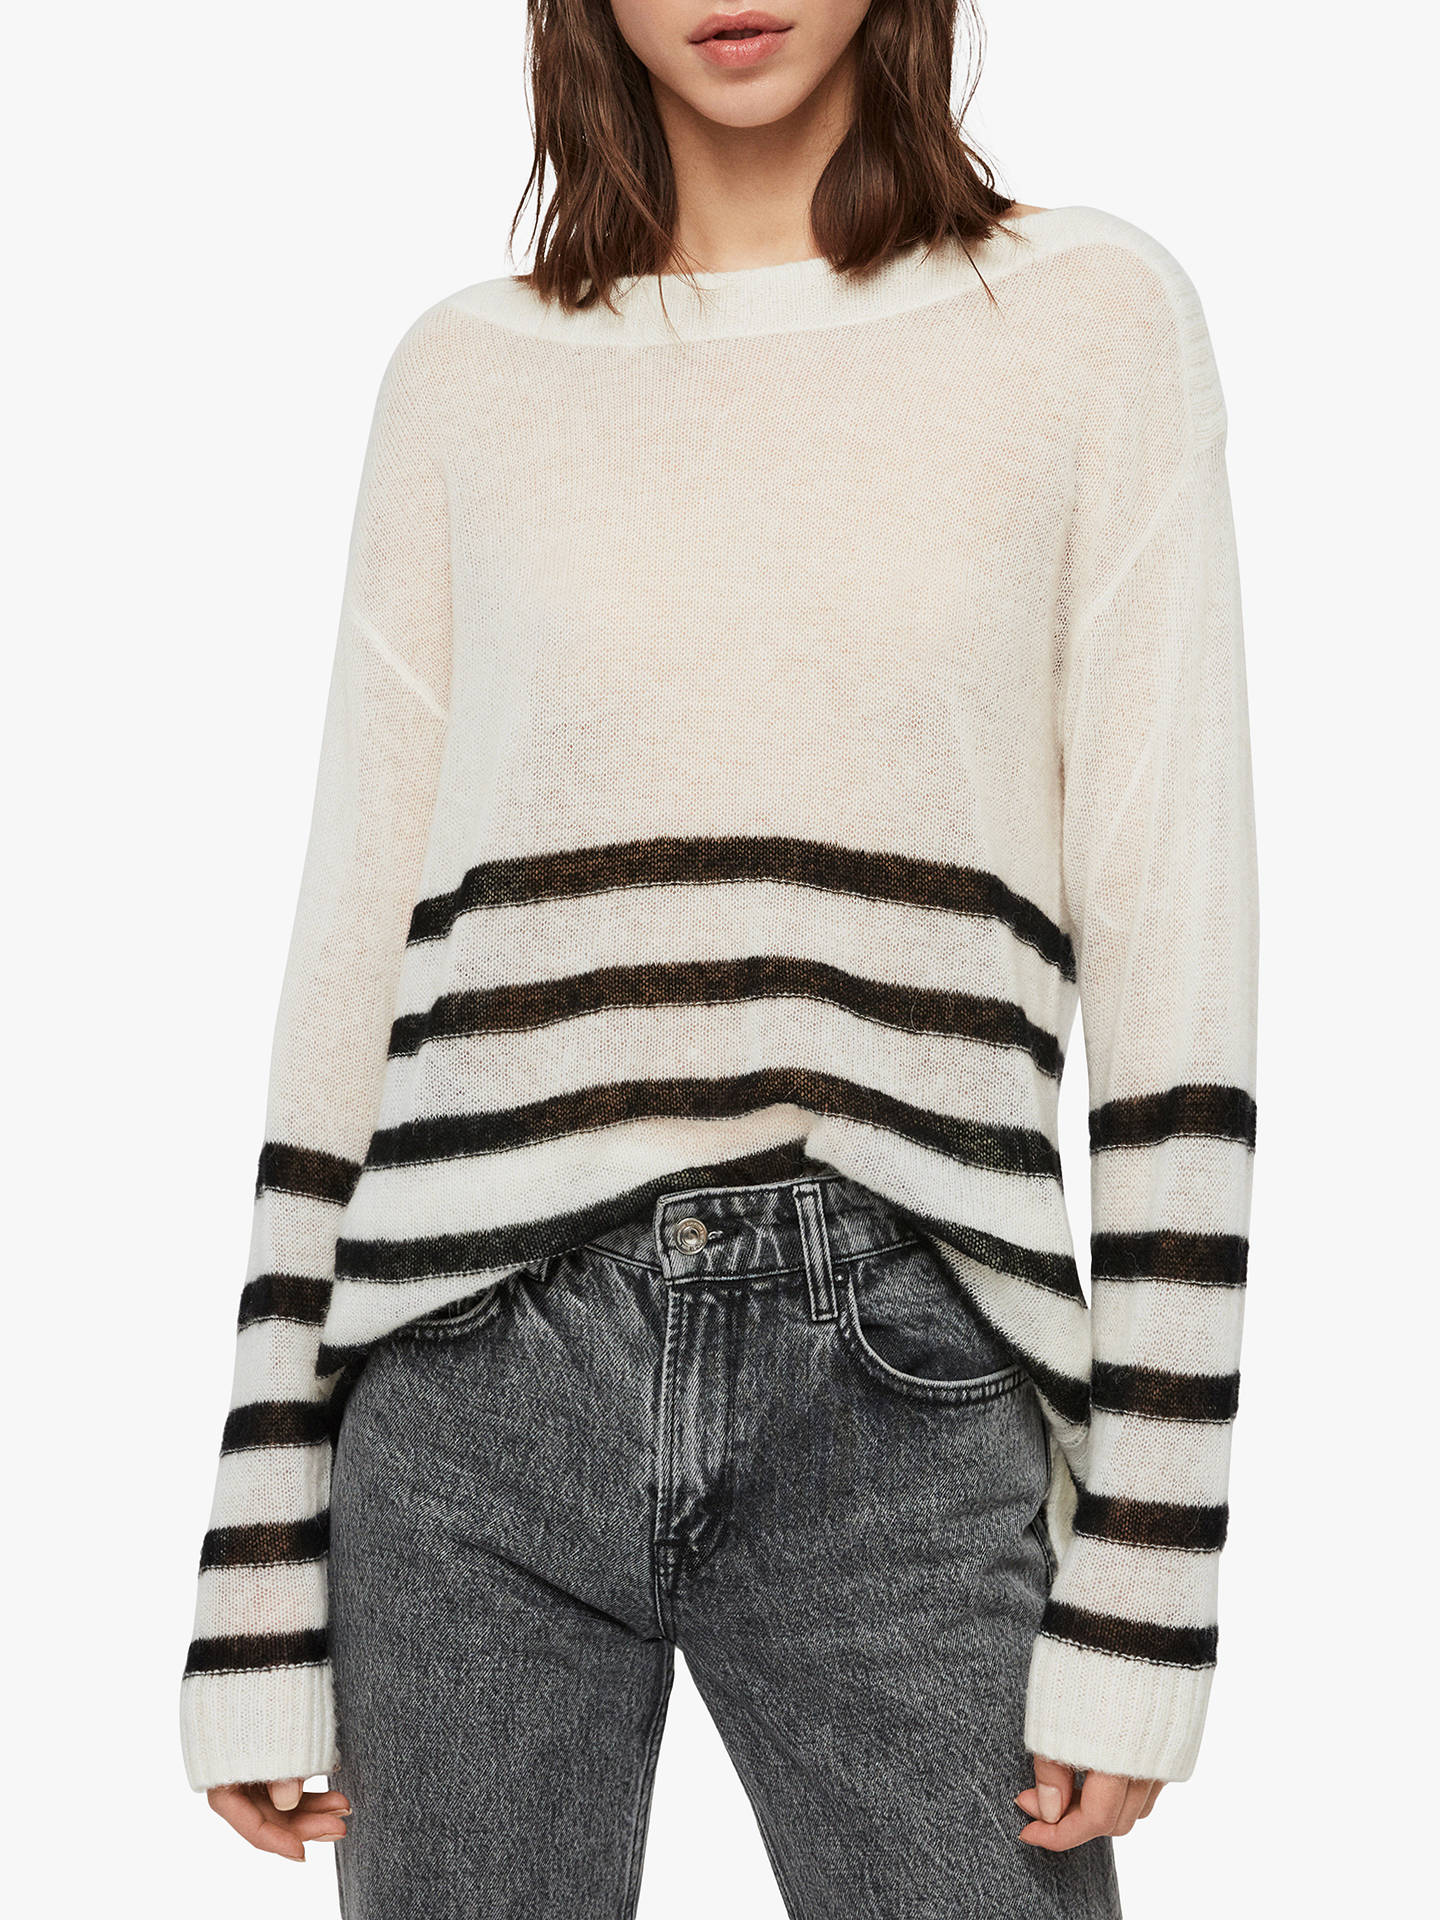 AllSaints Lune Wool Blend Jumper, Chalk White/Black